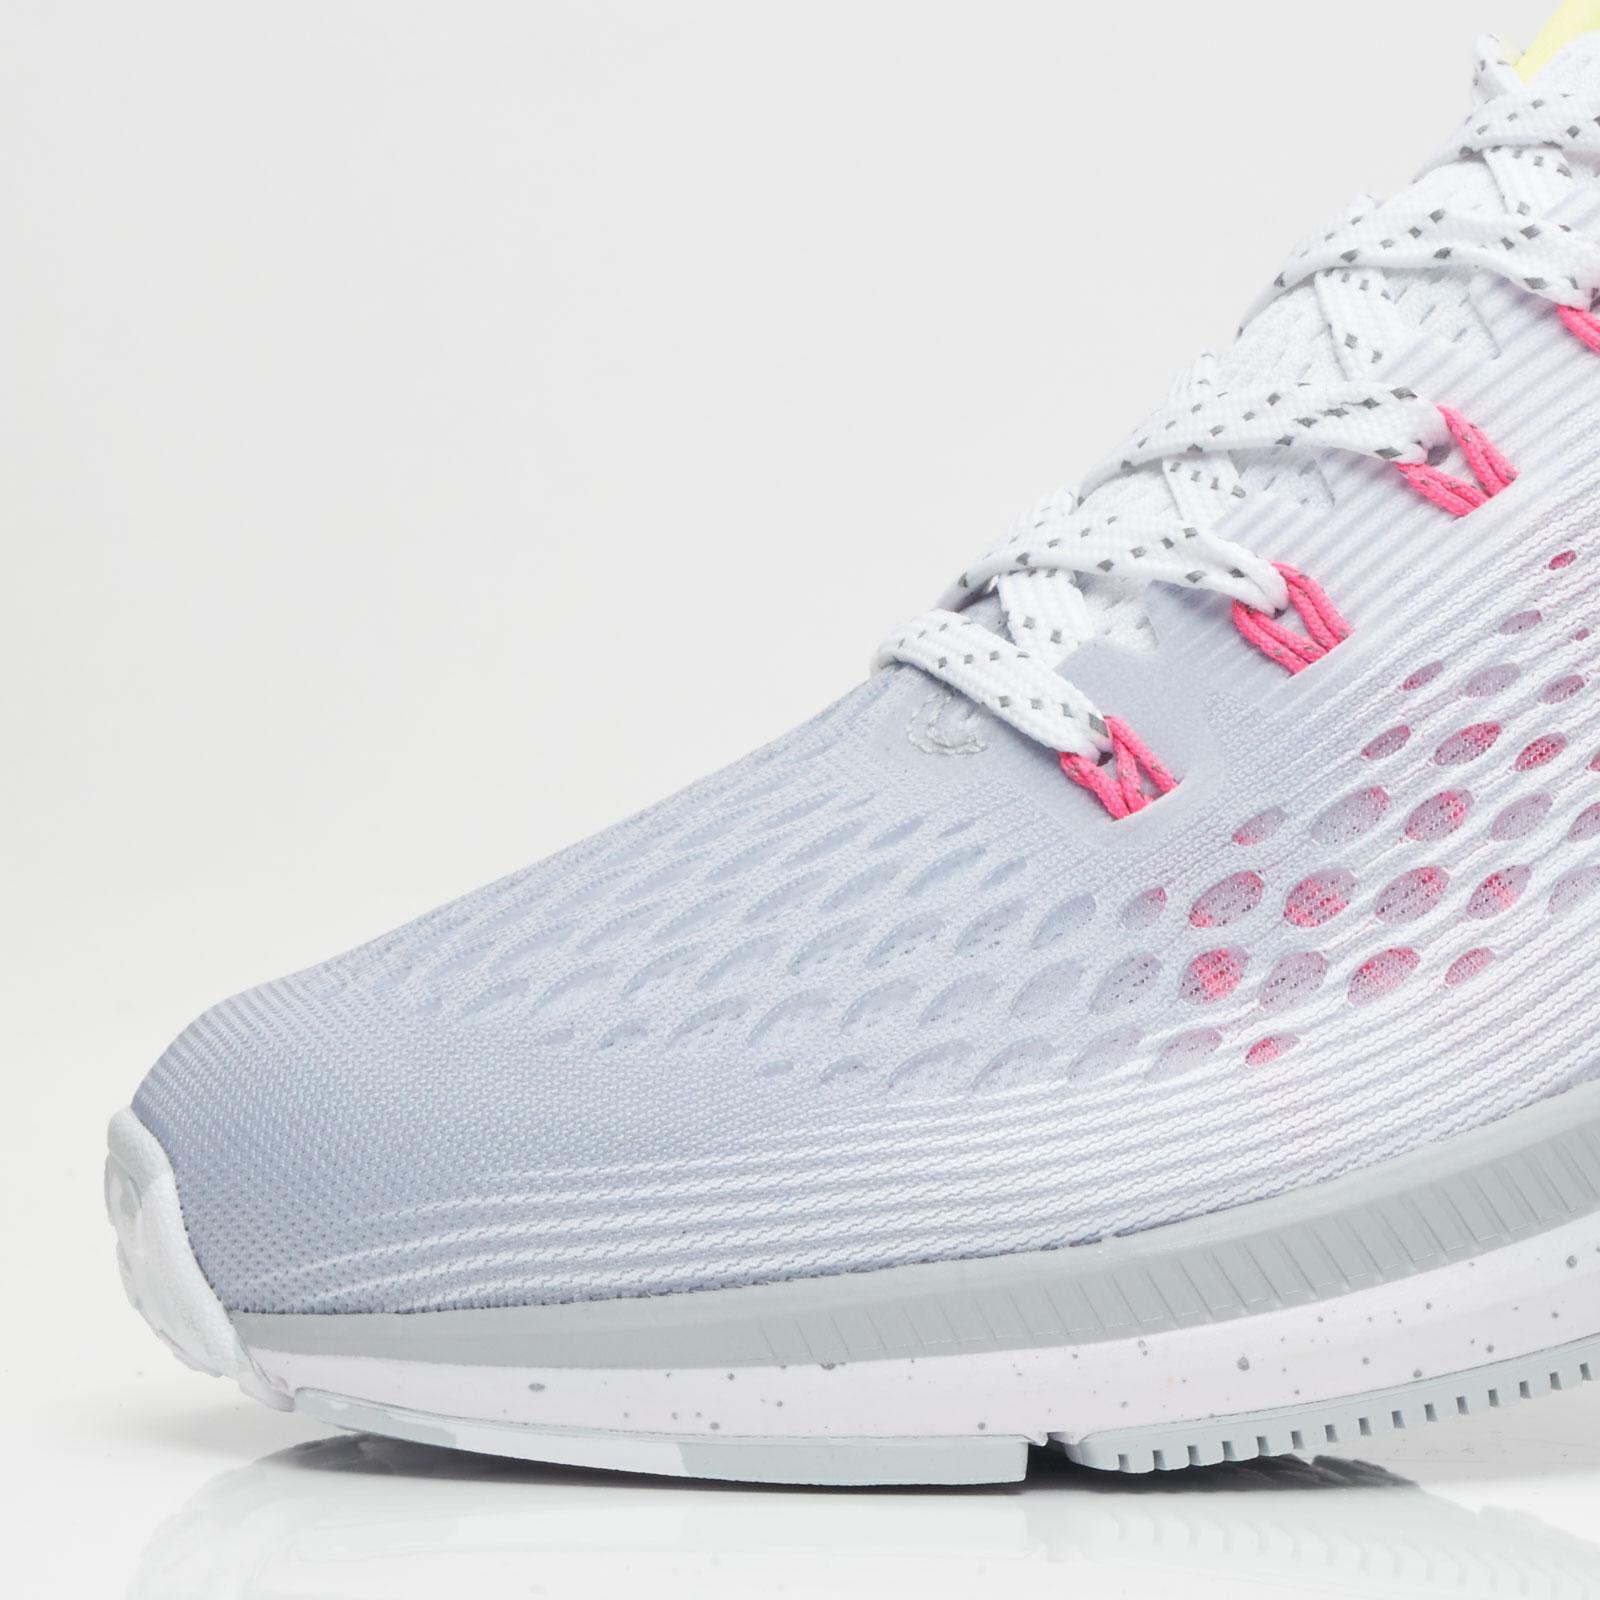 f4b6ca3273e1 Nike Air Zoom Pegasus 34 BETRUE - 899475-001 - Sneakersnstuff ...